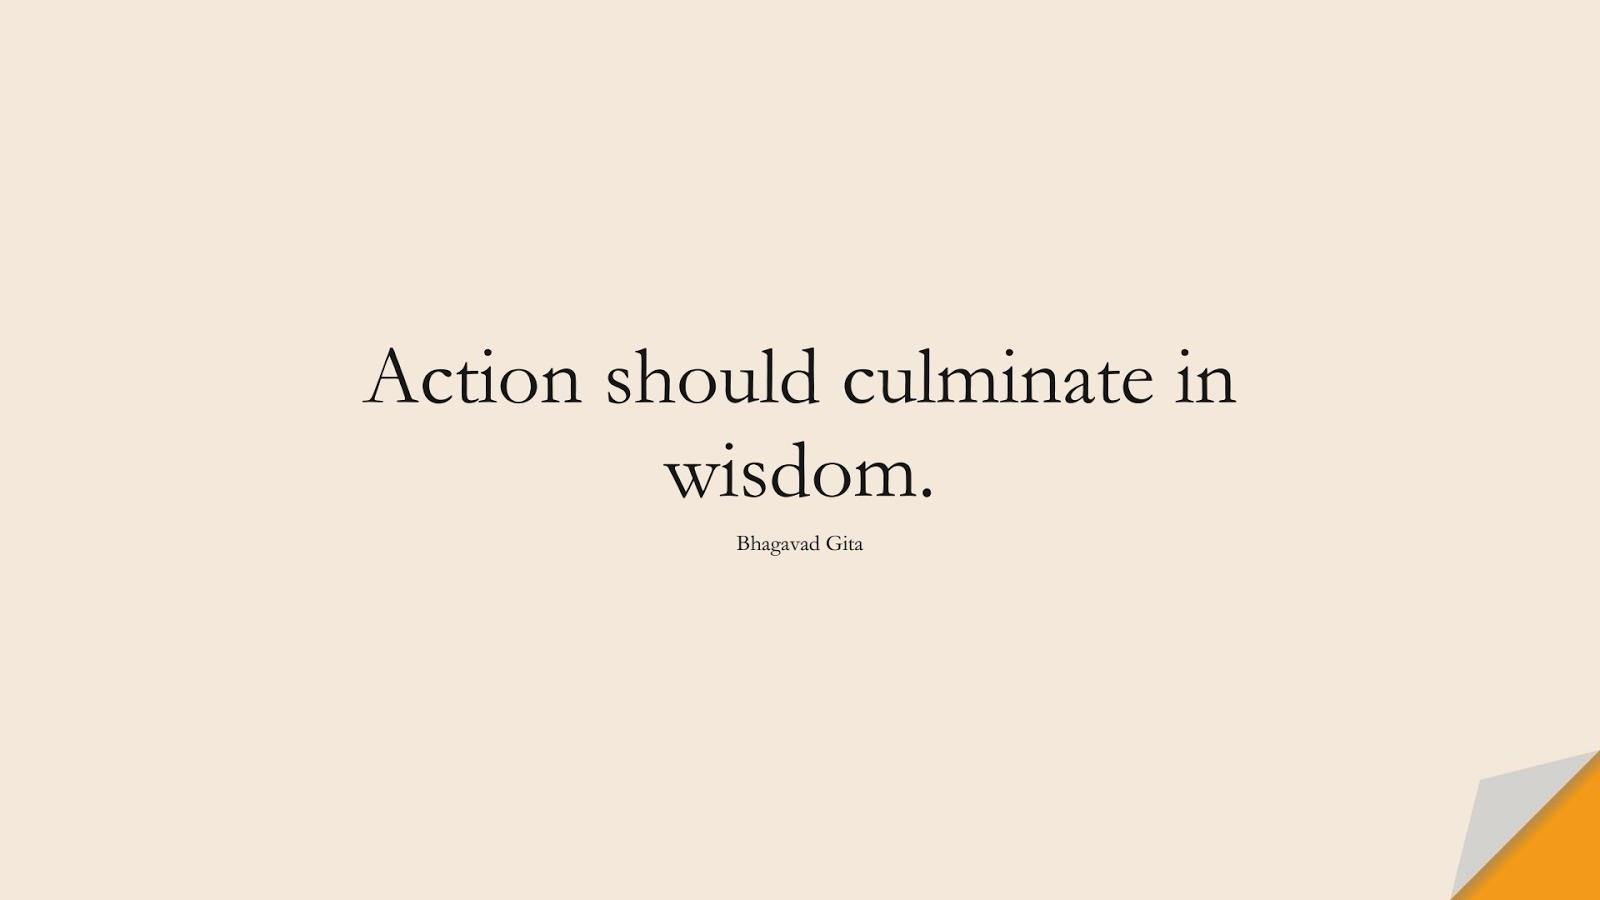 Action should culminate in wisdom. (Bhagavad Gita);  #WordsofWisdom